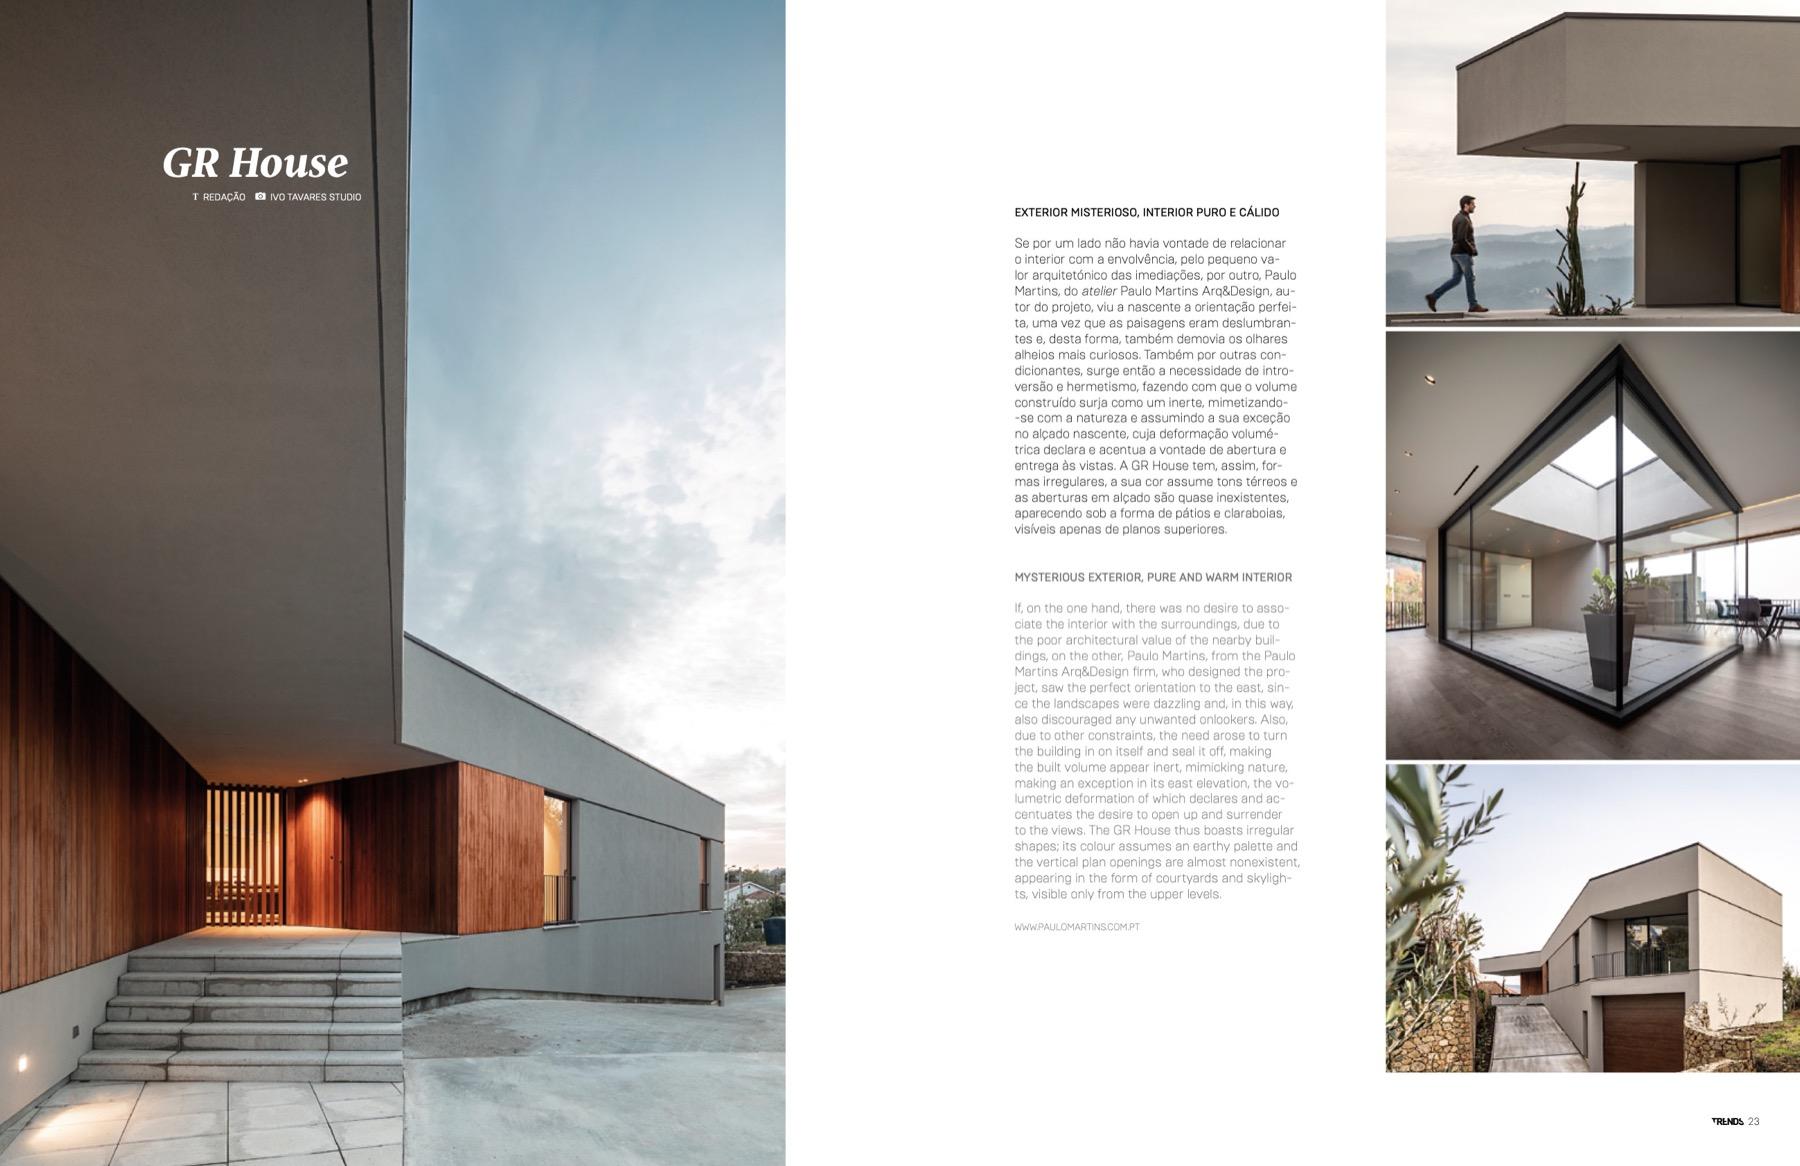 TRENDS 73 bala atelier box arquitectos paulo martins mimool studere 12 12